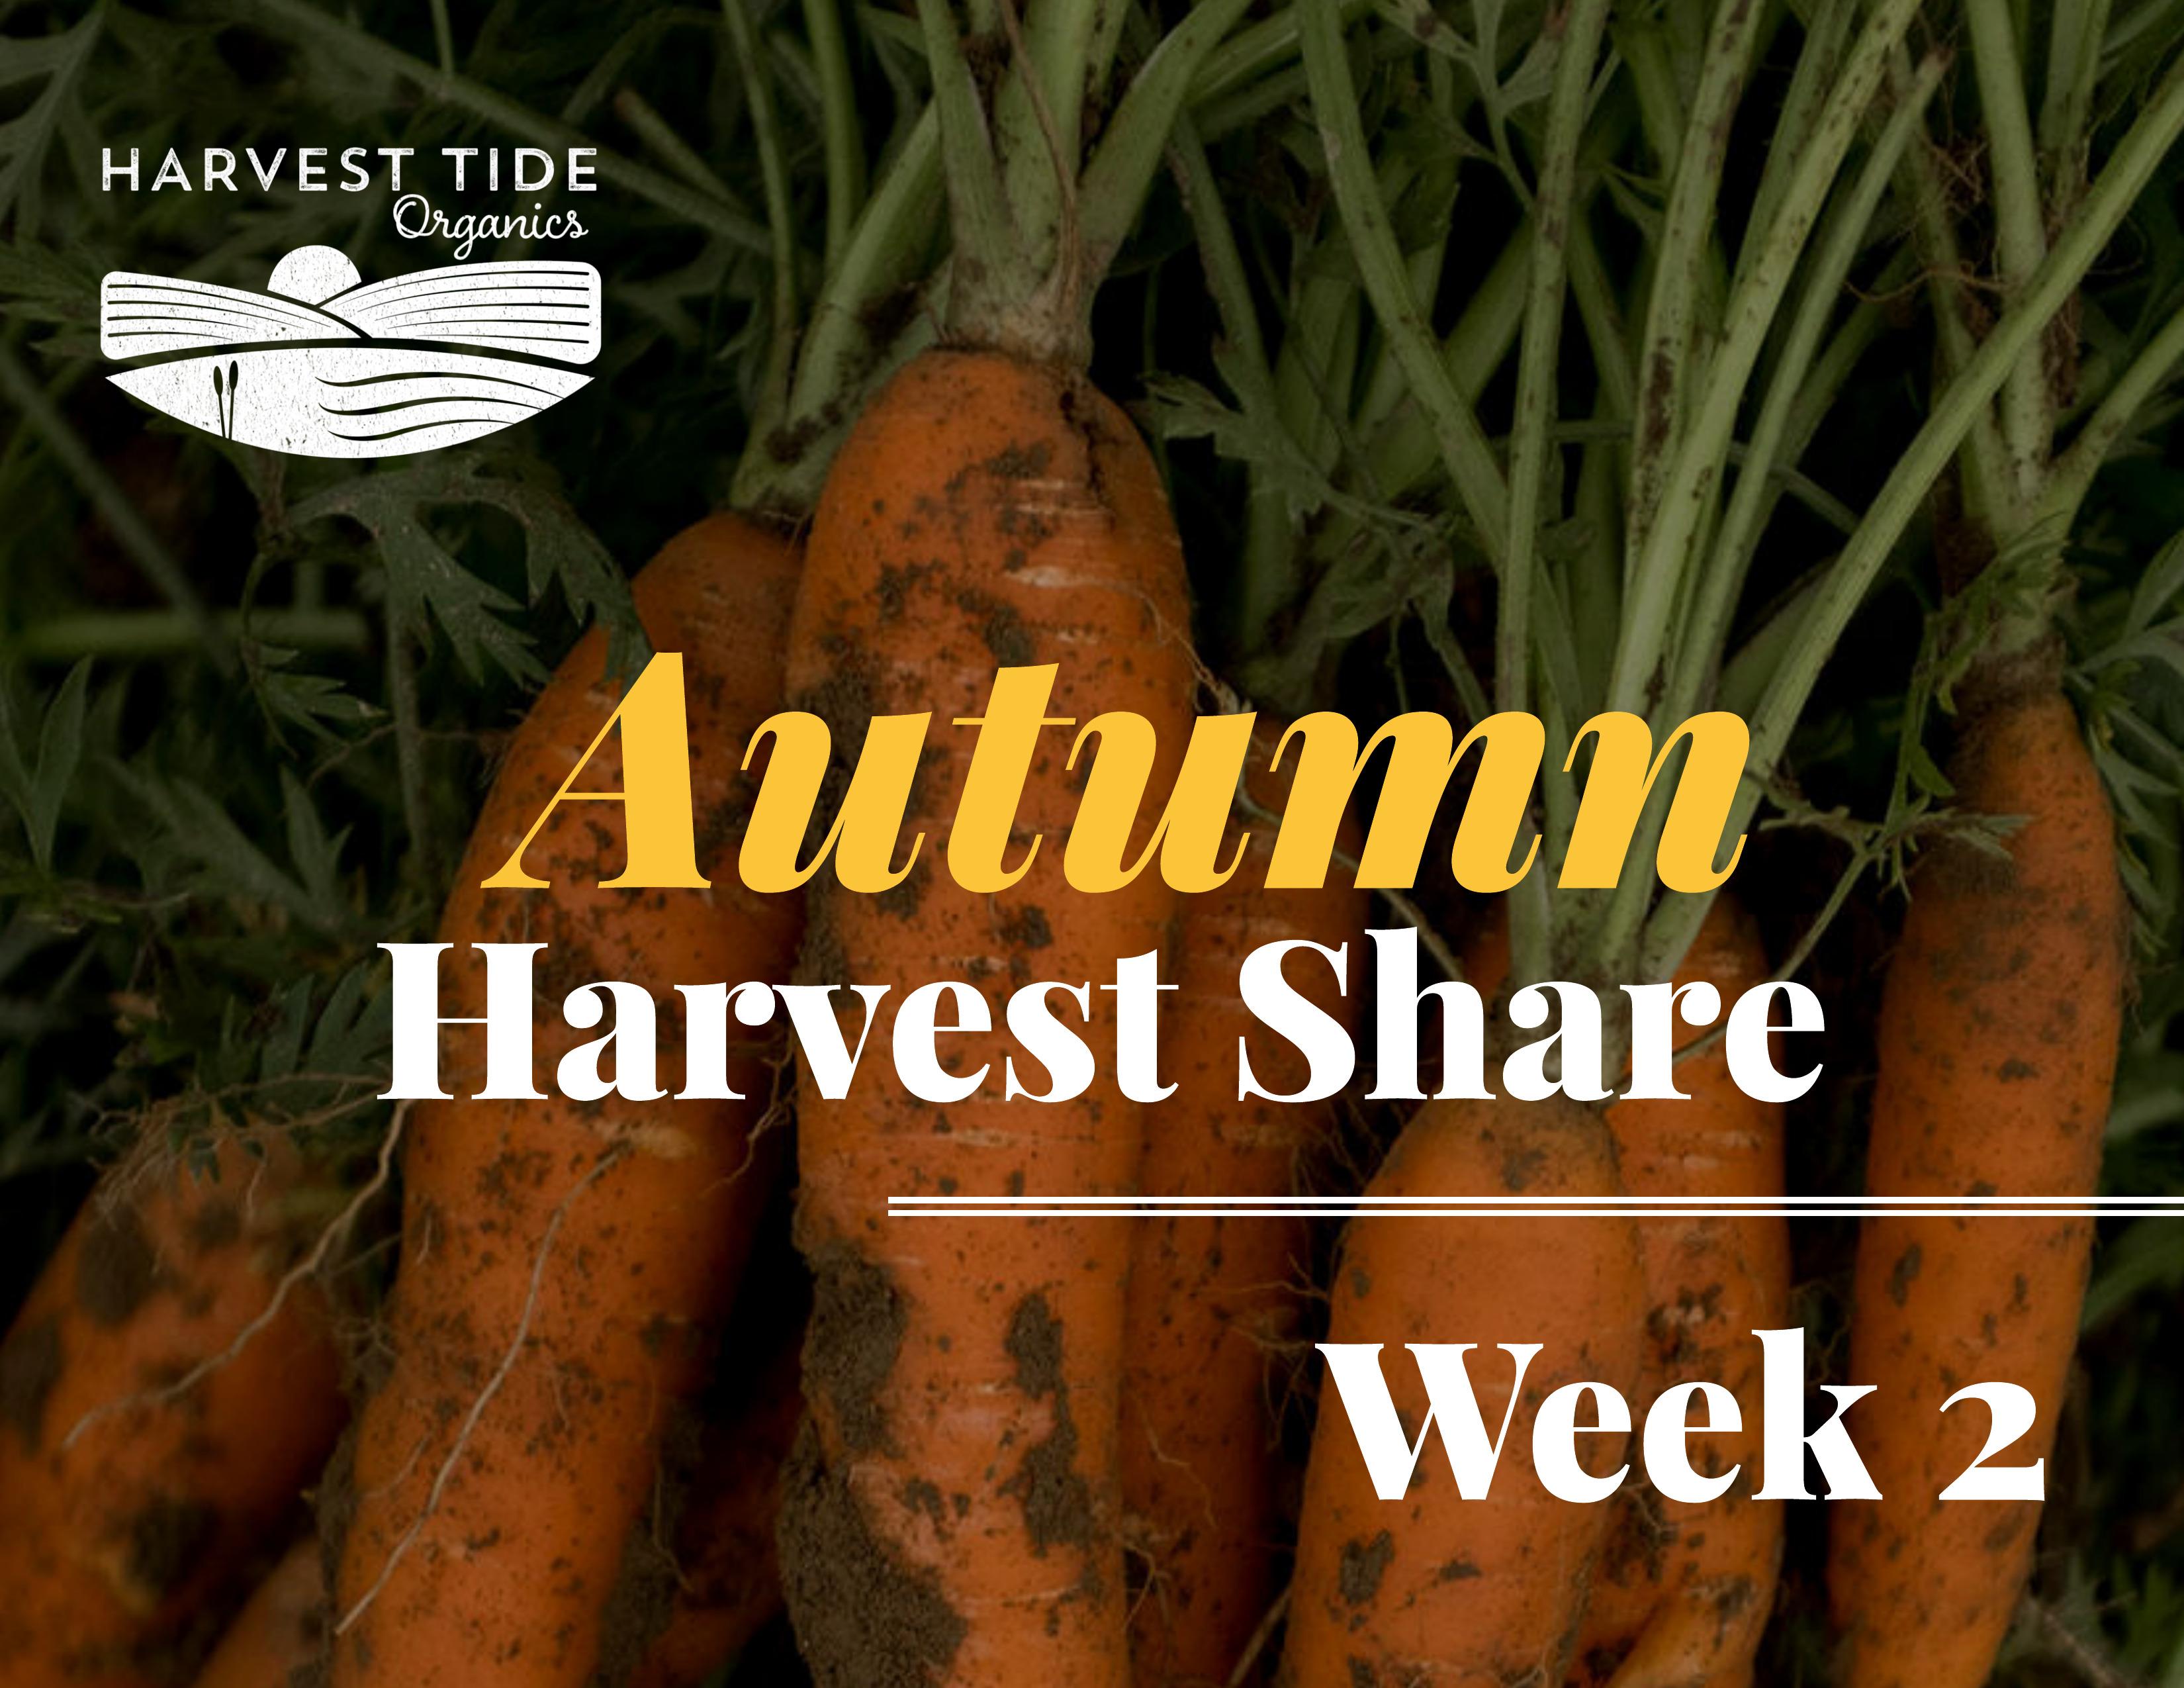 Autumn Harvest Share - Week 2